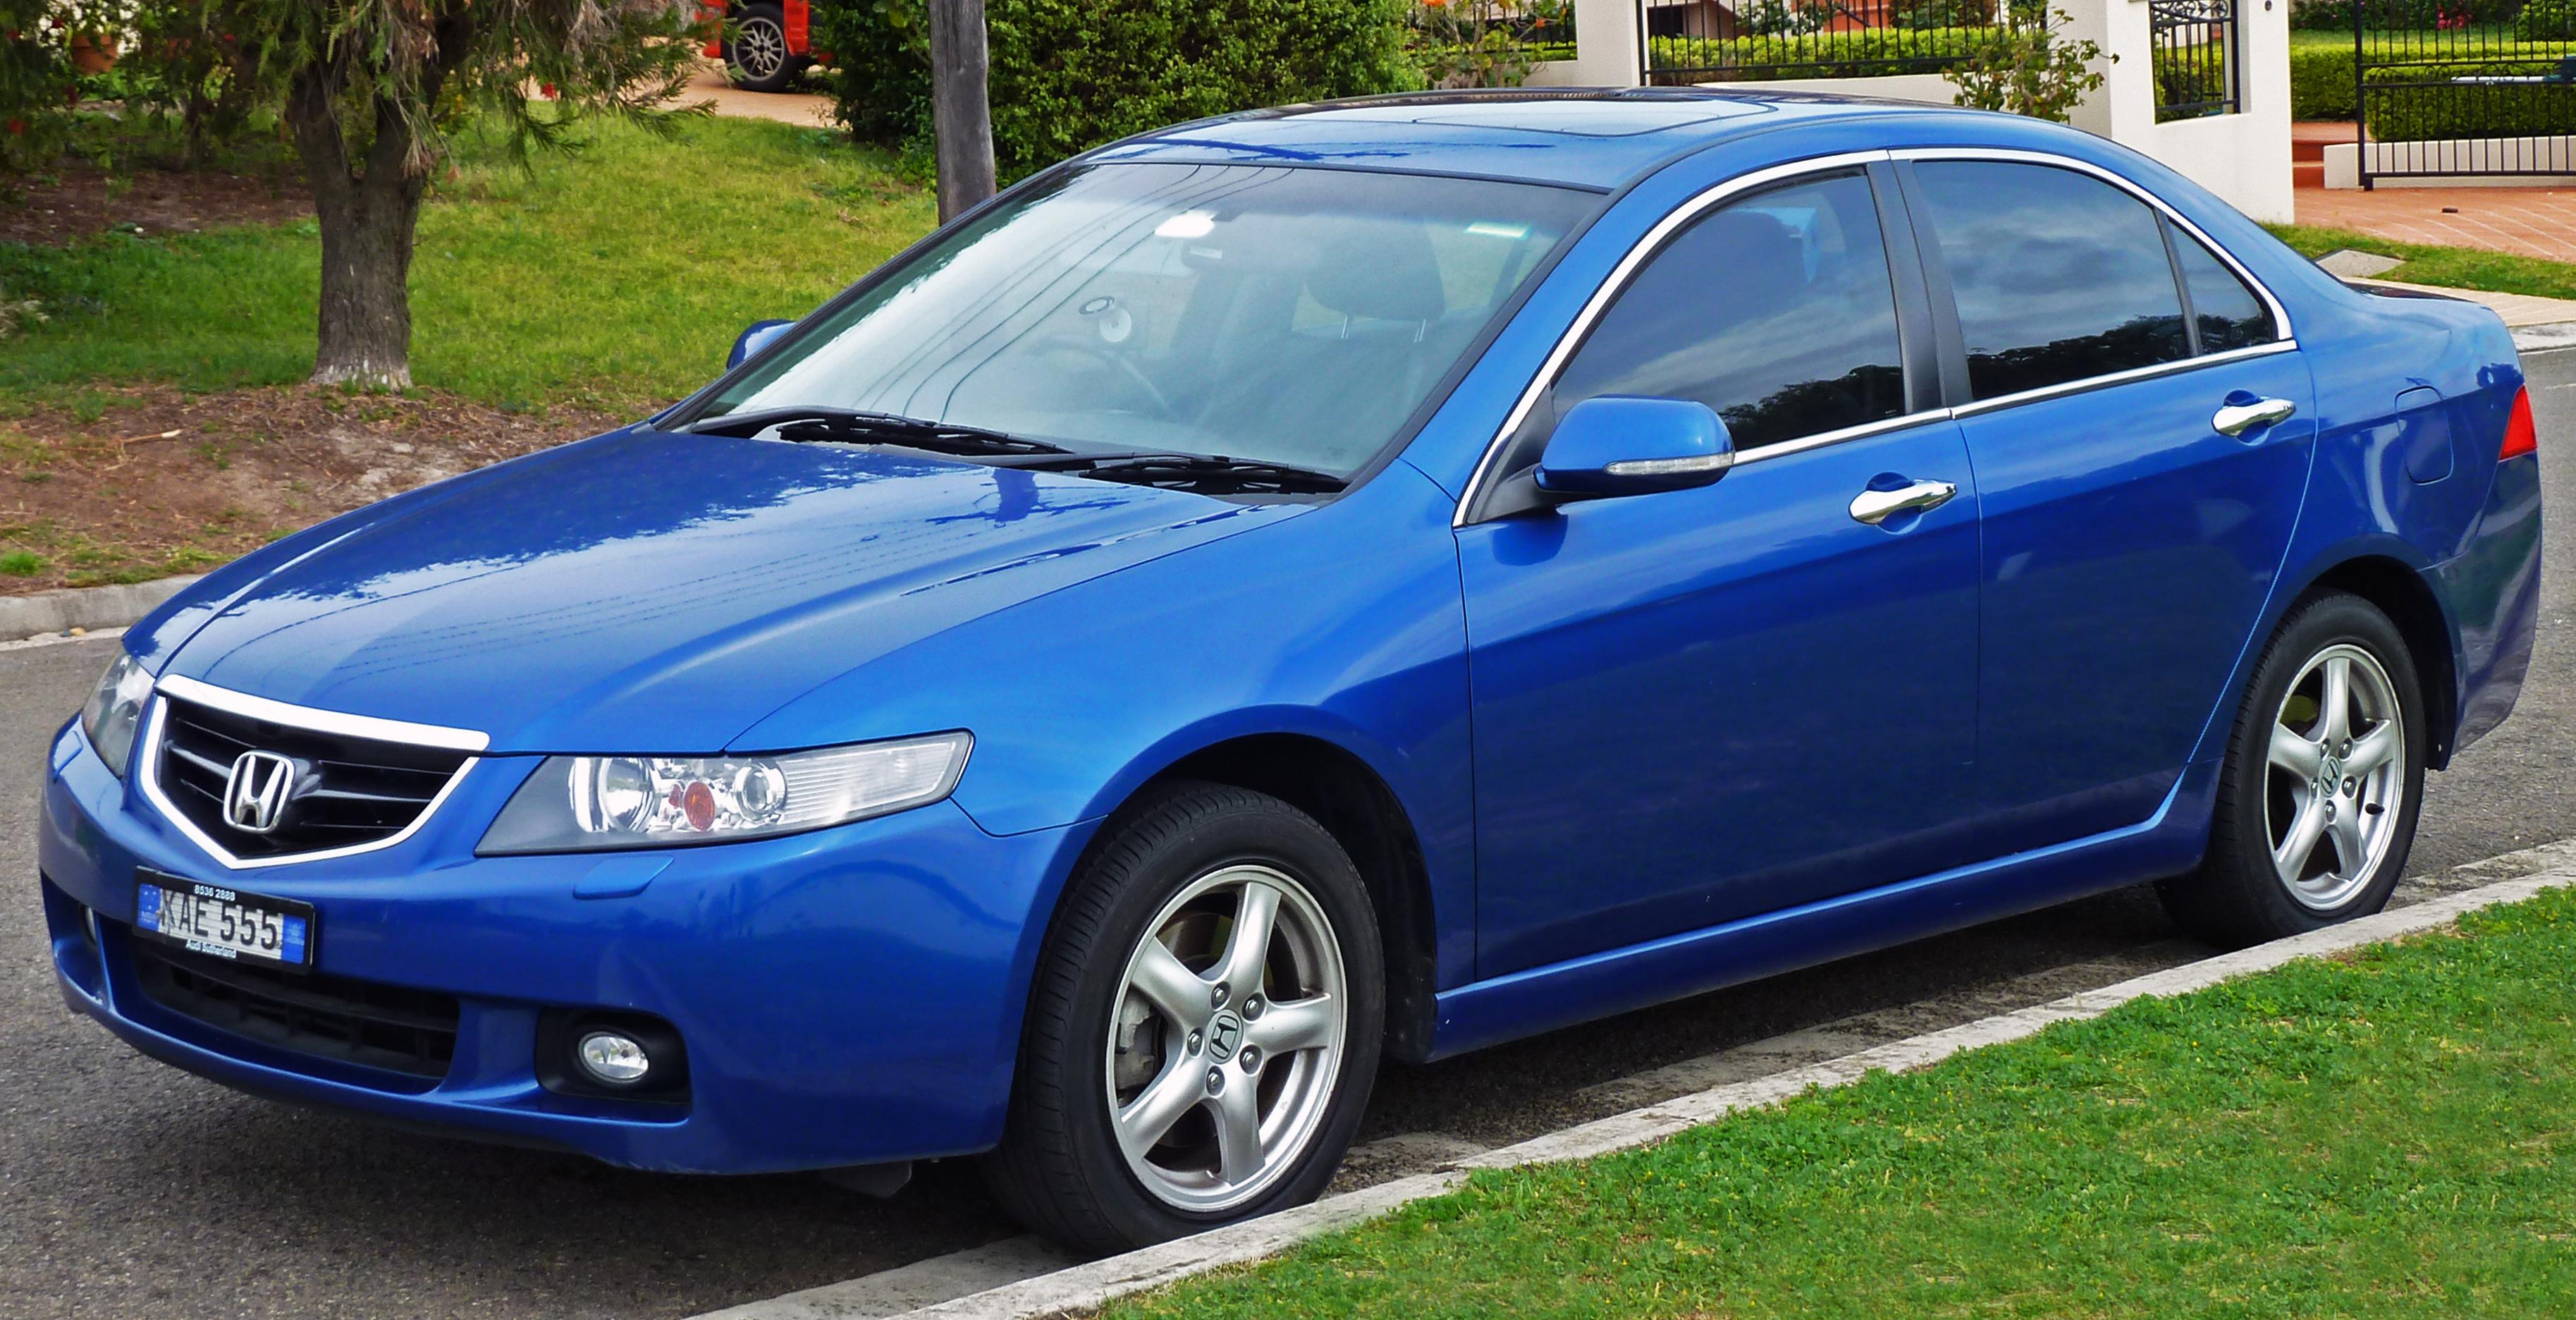 Honda Accord Sport >> File:2003-2005 Honda Accord Euro Luxury sedan (2010-09-19 ...